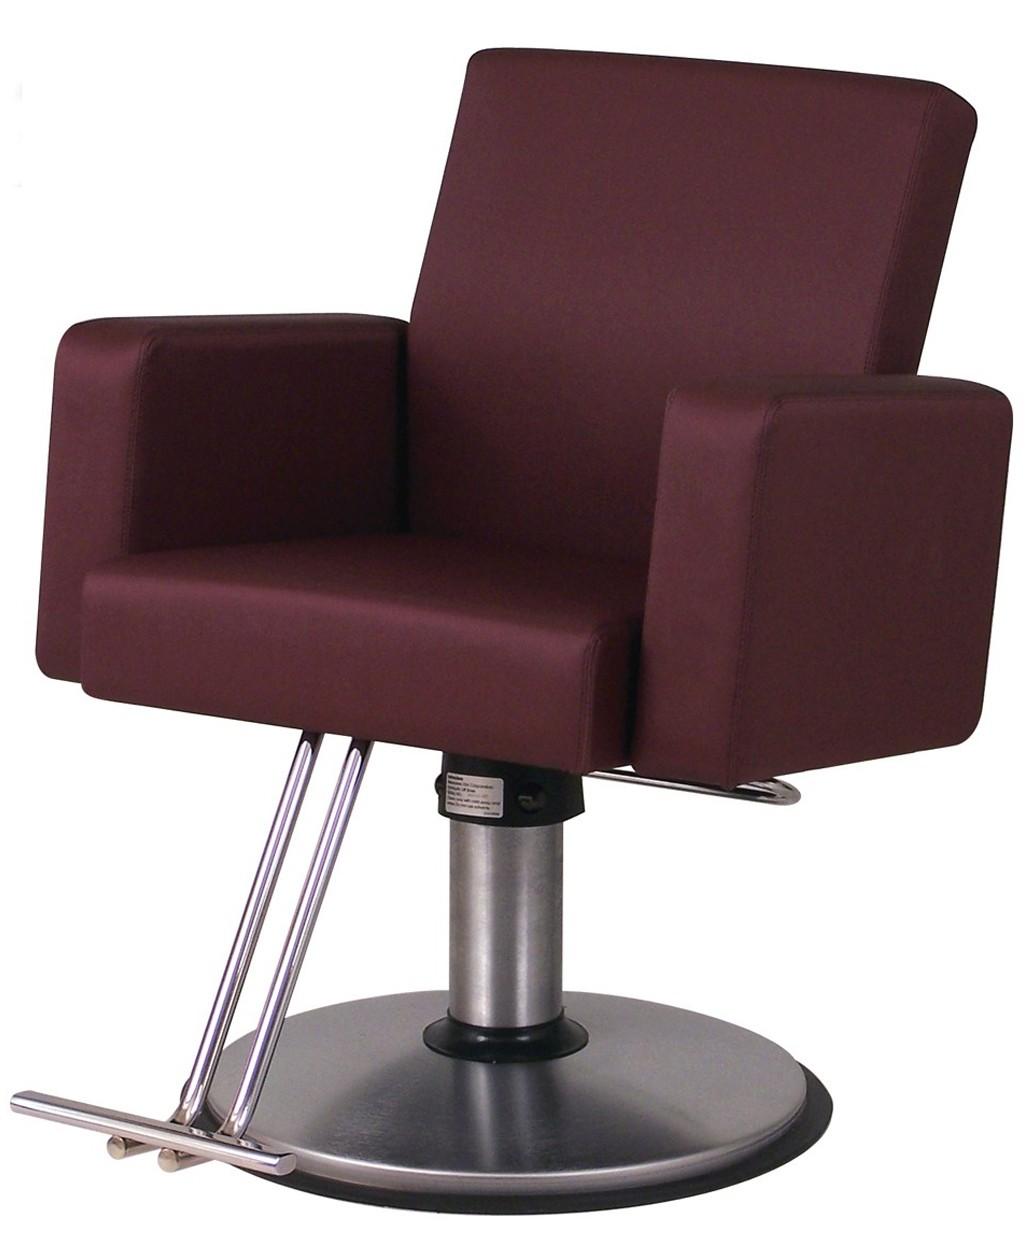 Belvedere PH12 Plush Styling Chair